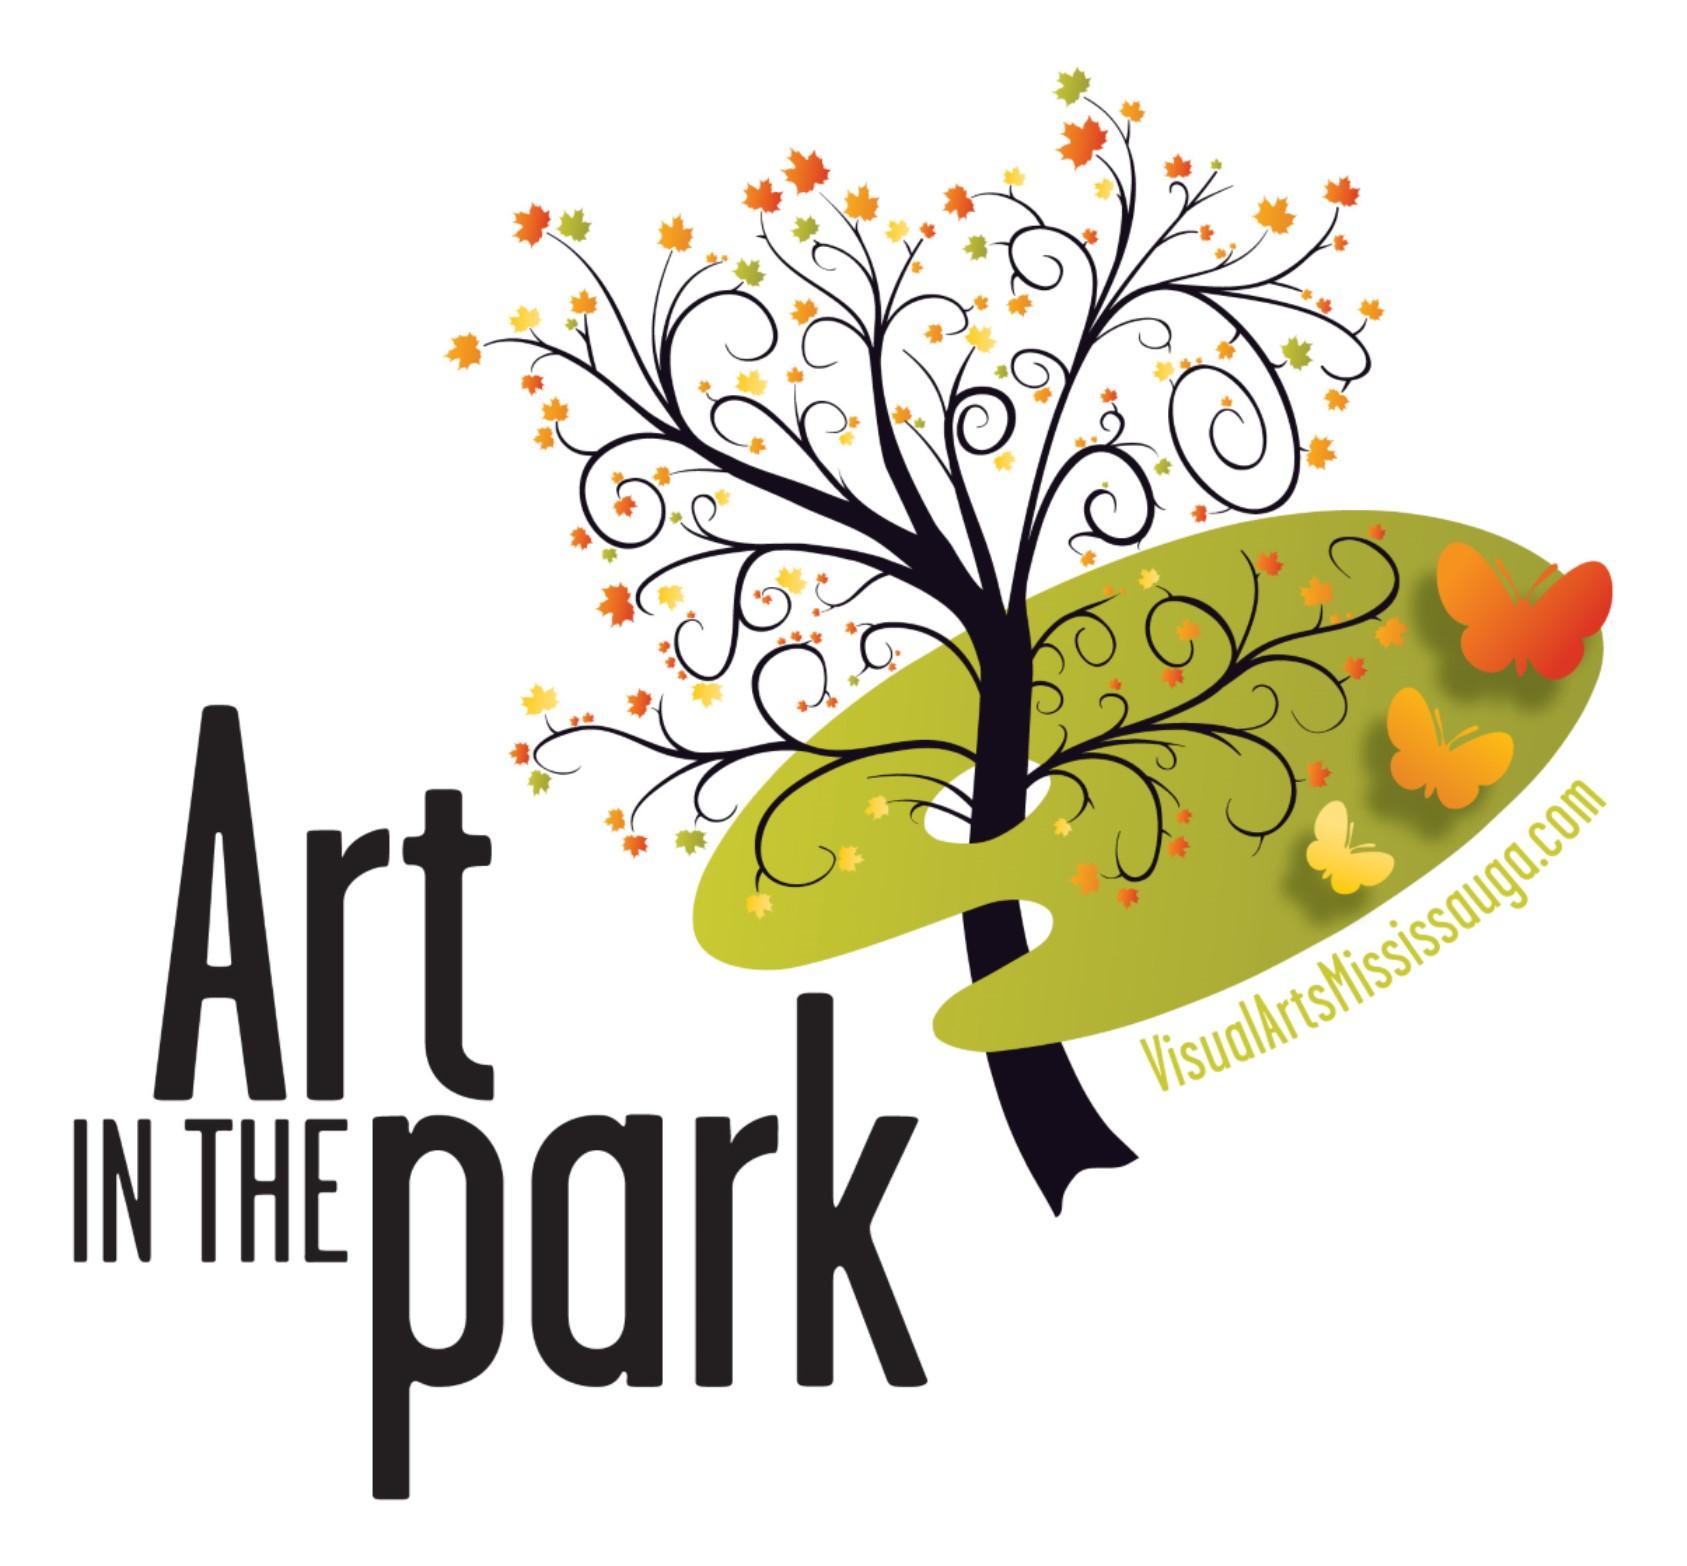 Art in the Park - Visual Arts Mississauga at Riverwood